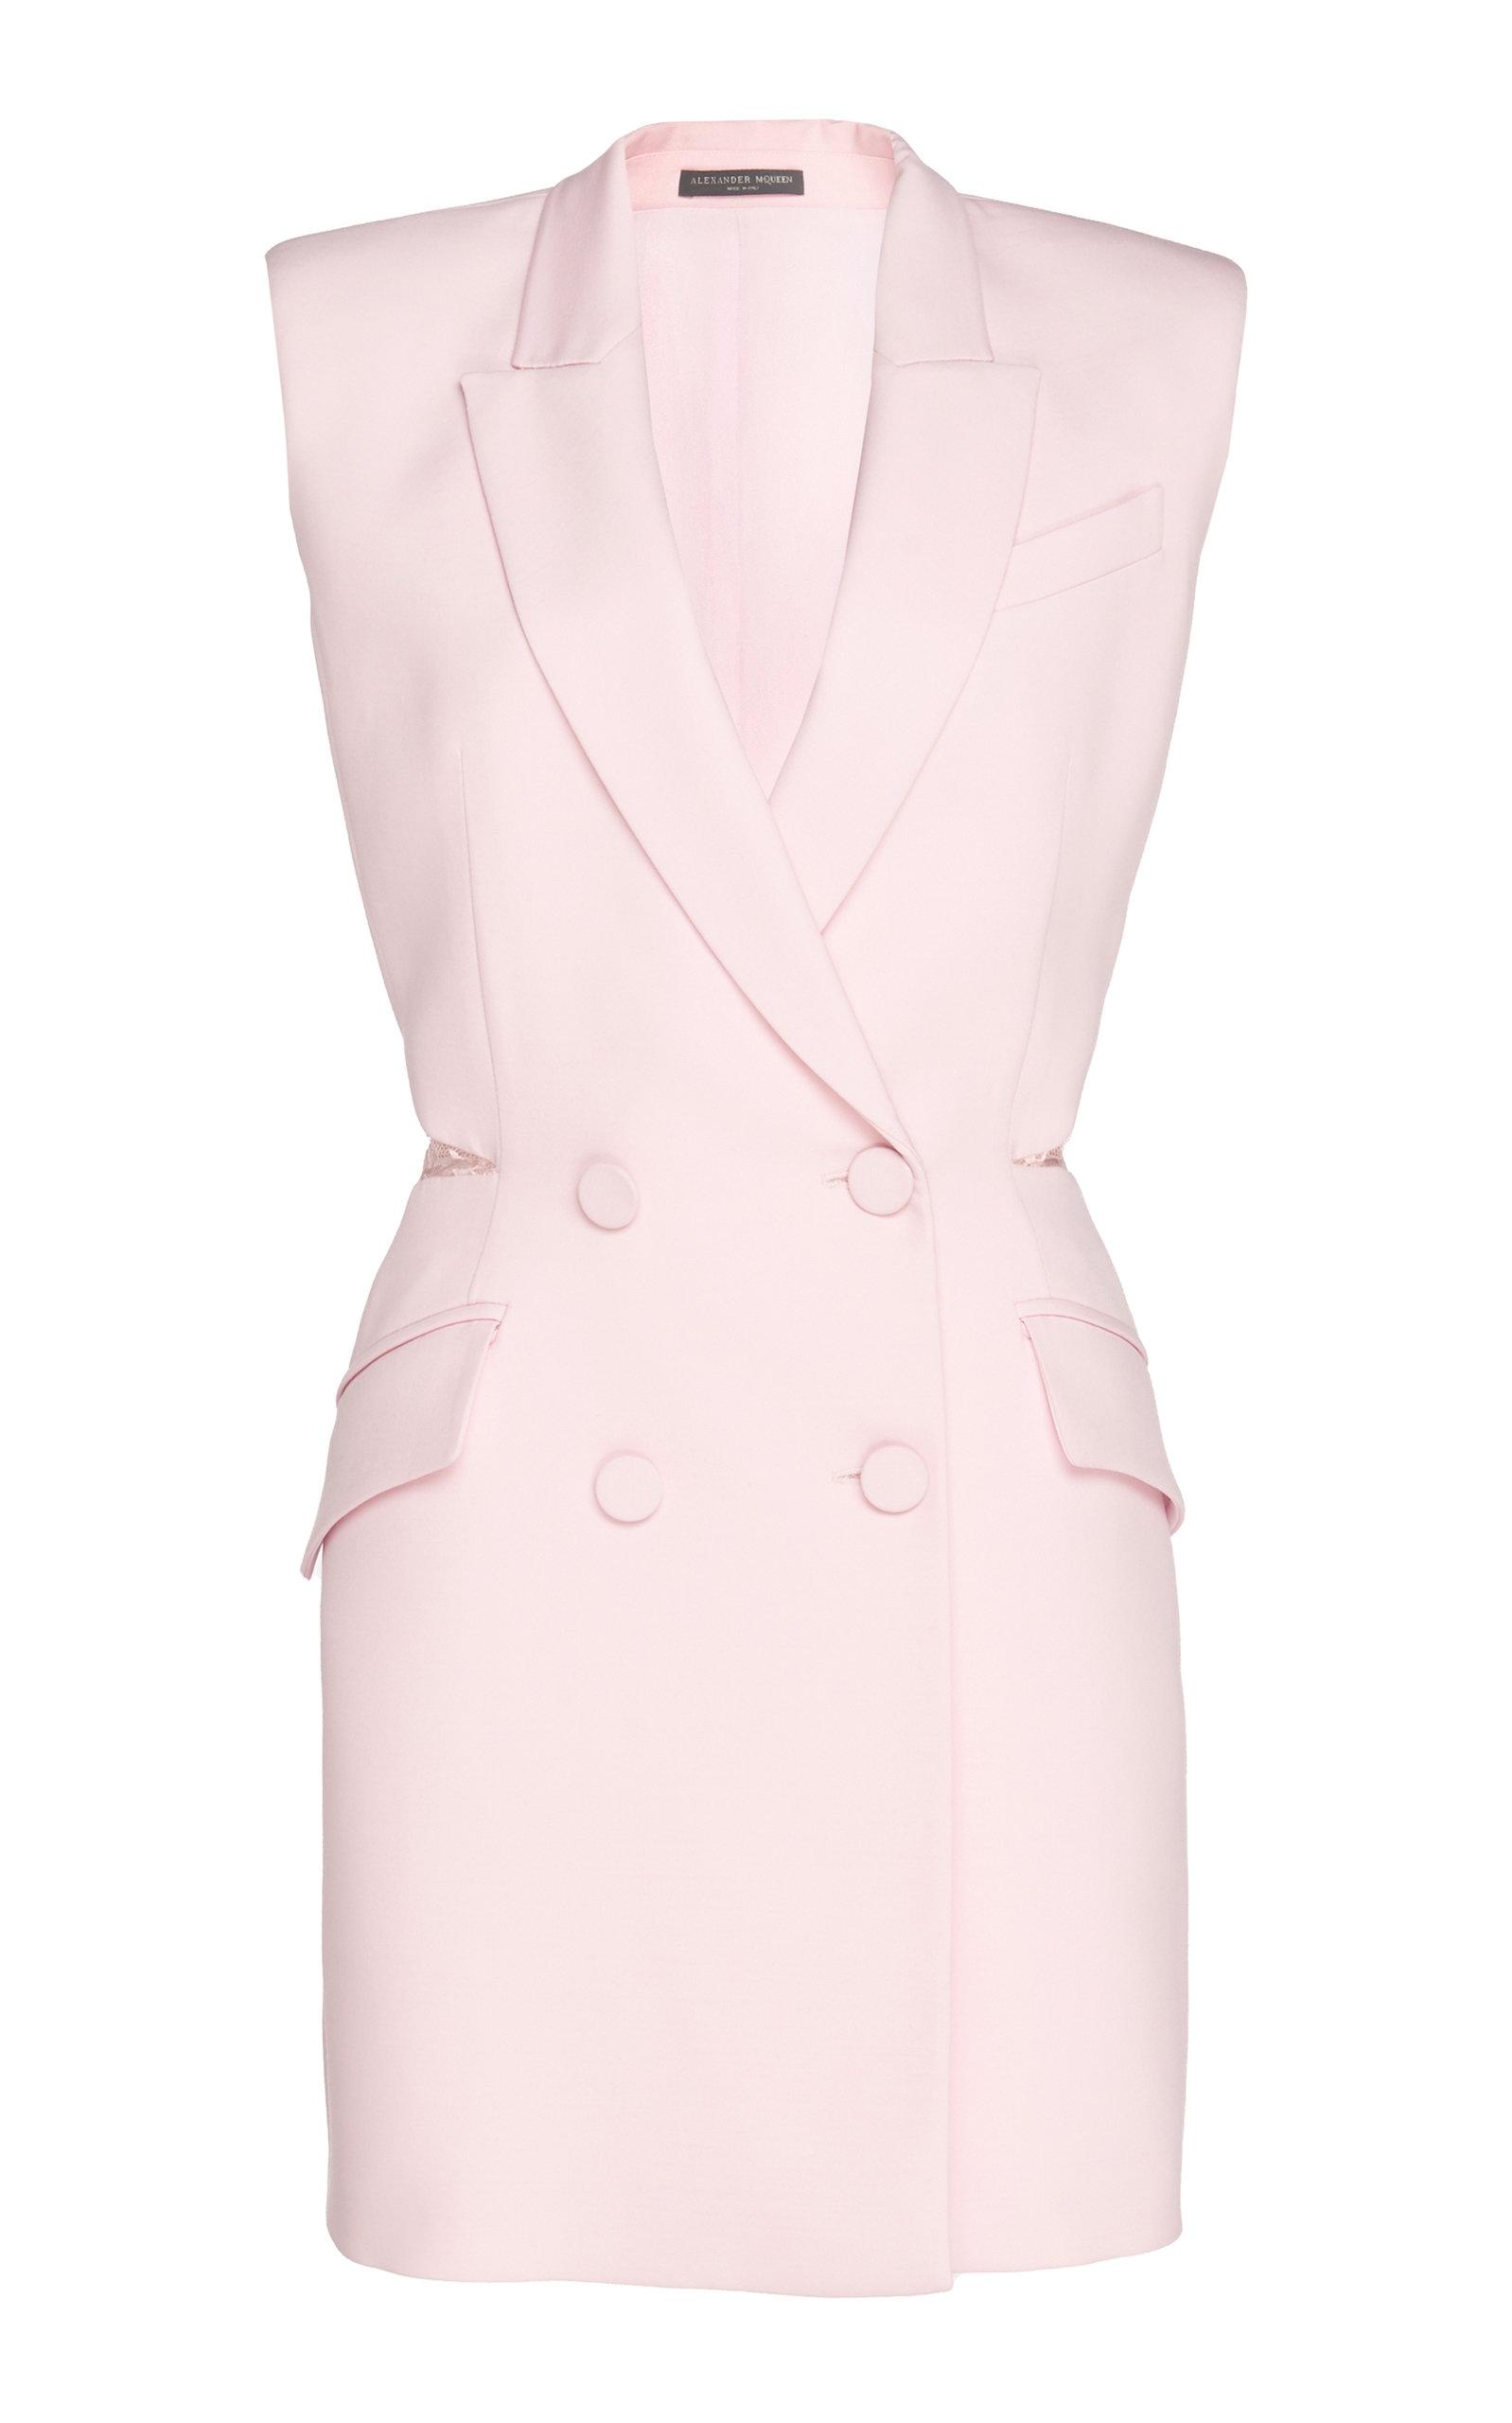 Alexander Mcqueen Jackets Double Breasted Light Wool-Blend Vest